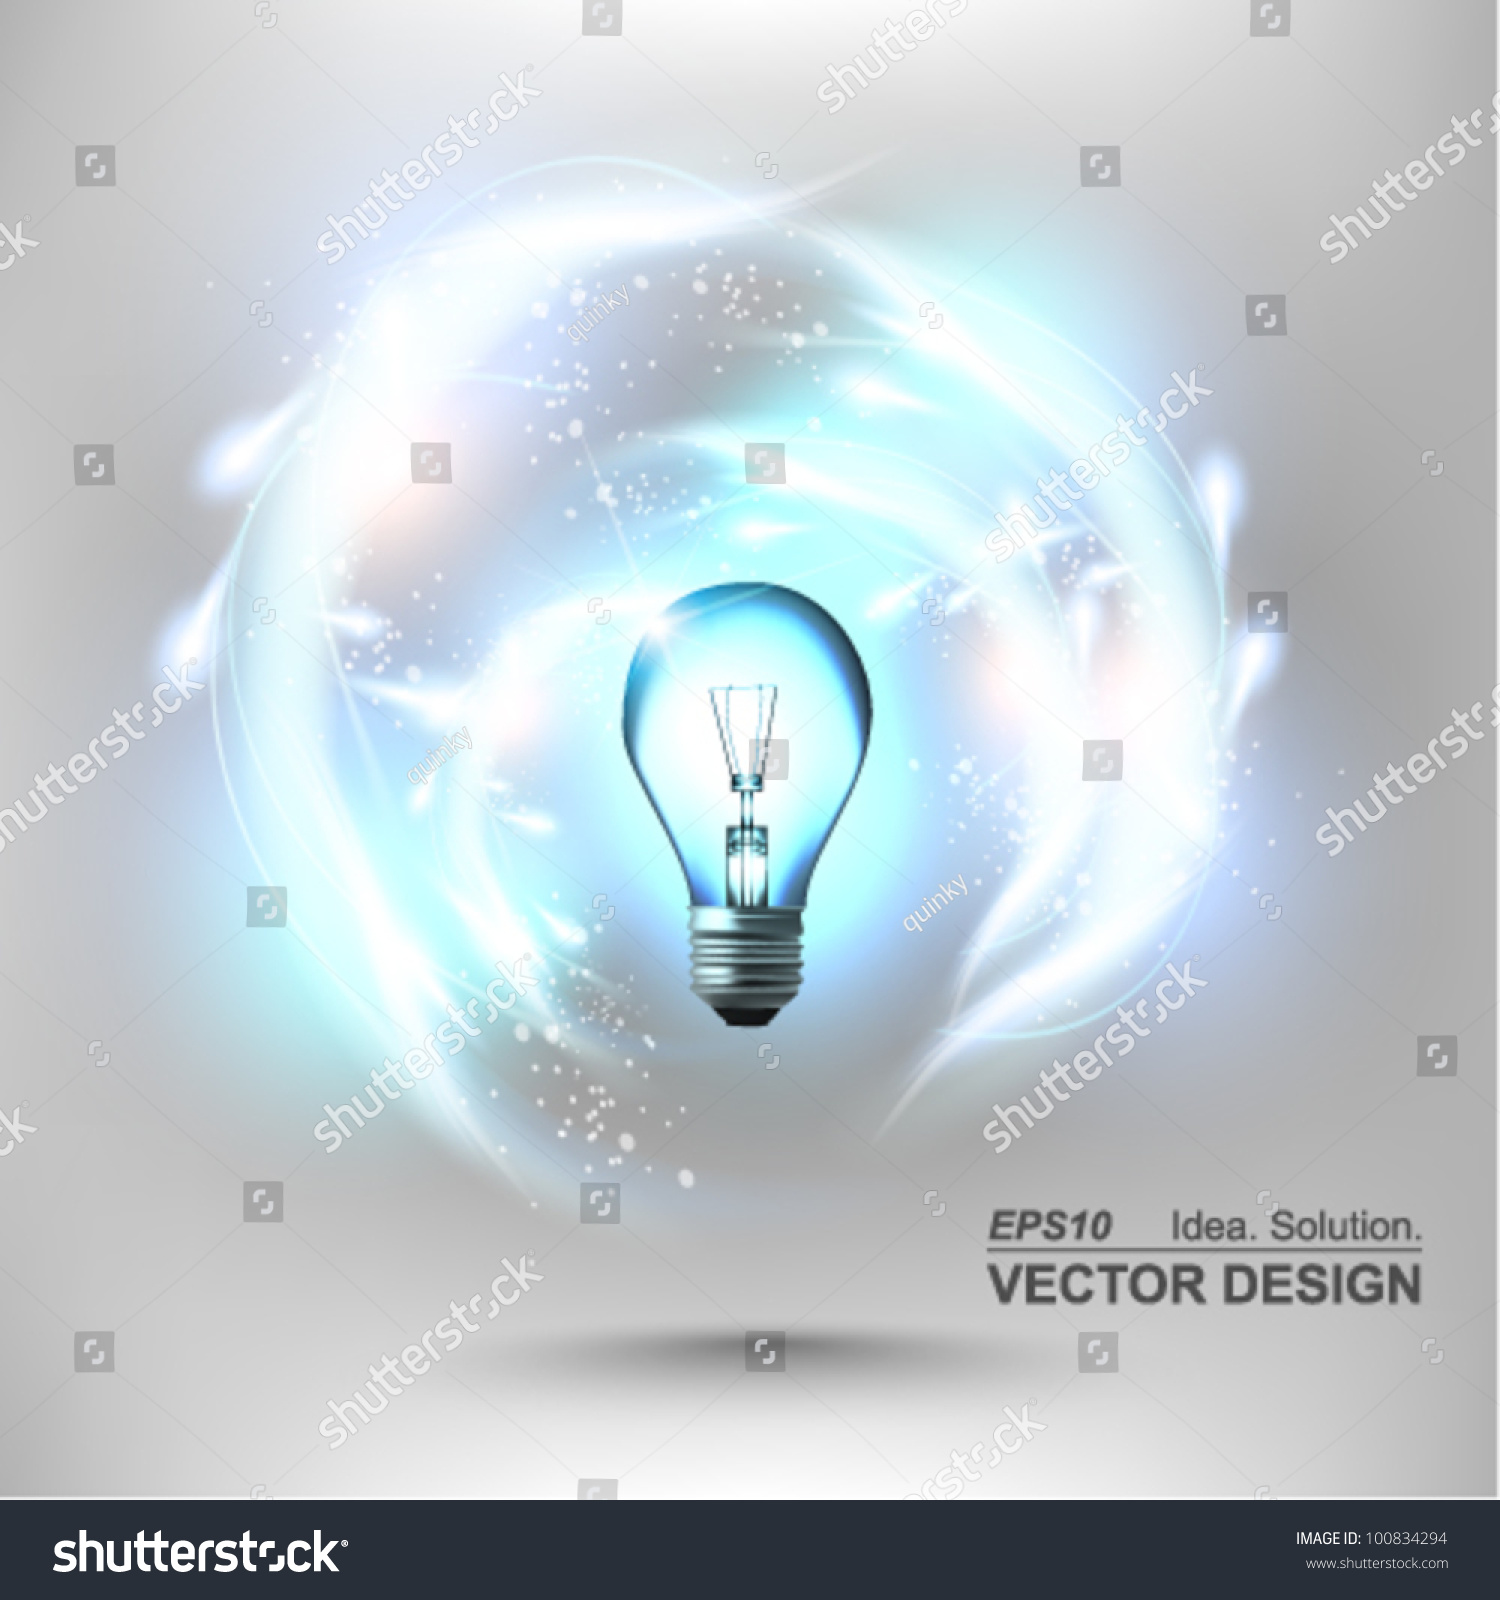 Idea Design 5 idea design Stylish Conceptual Digital Light Bulb Idea Design Stock Vector Illustration 100834294 Shutterstock